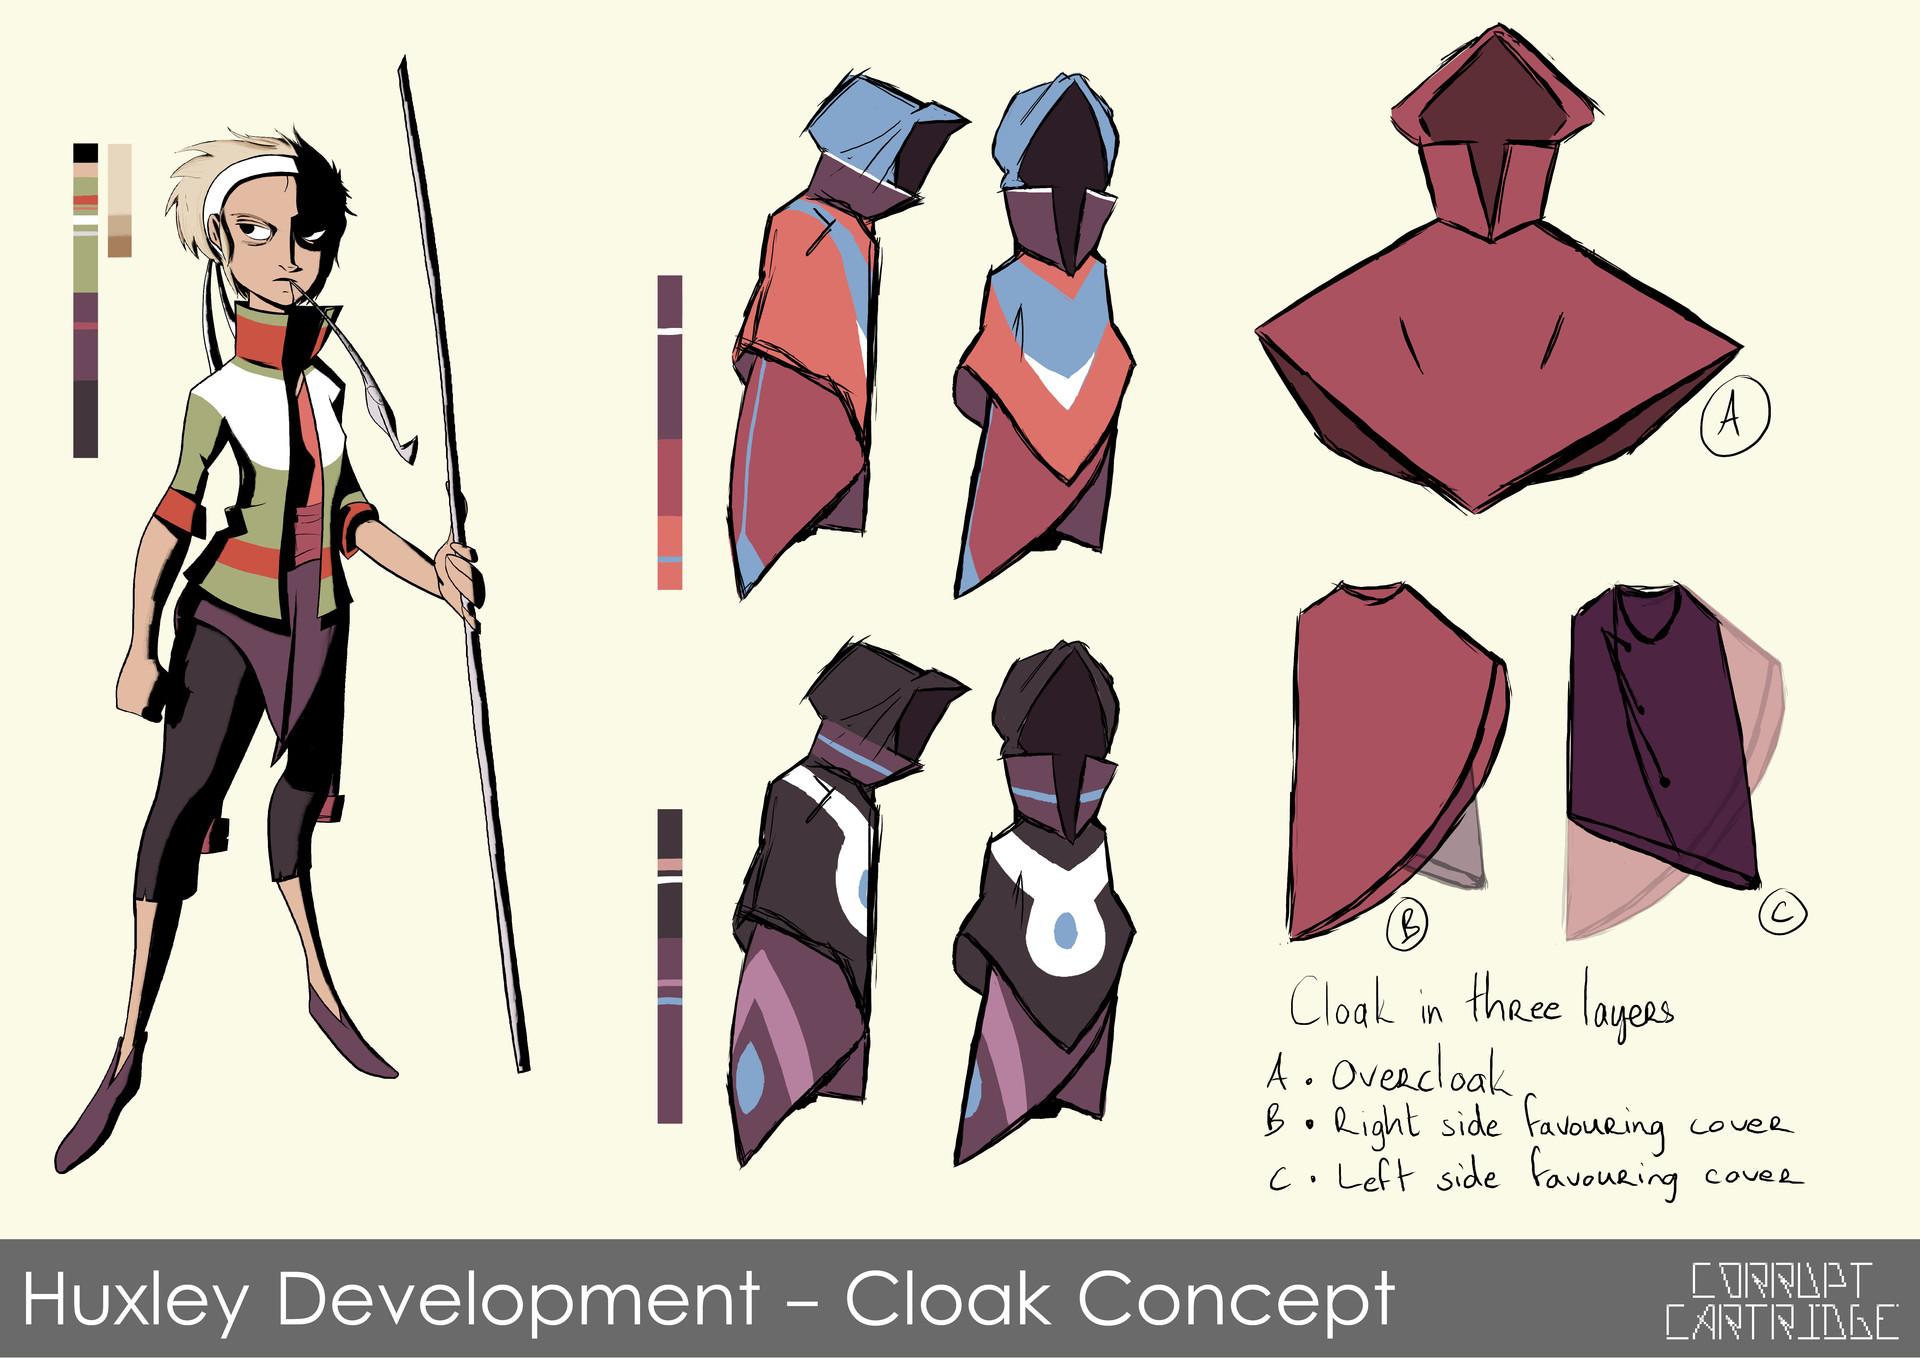 Craig mullins 12 huxley cloak a